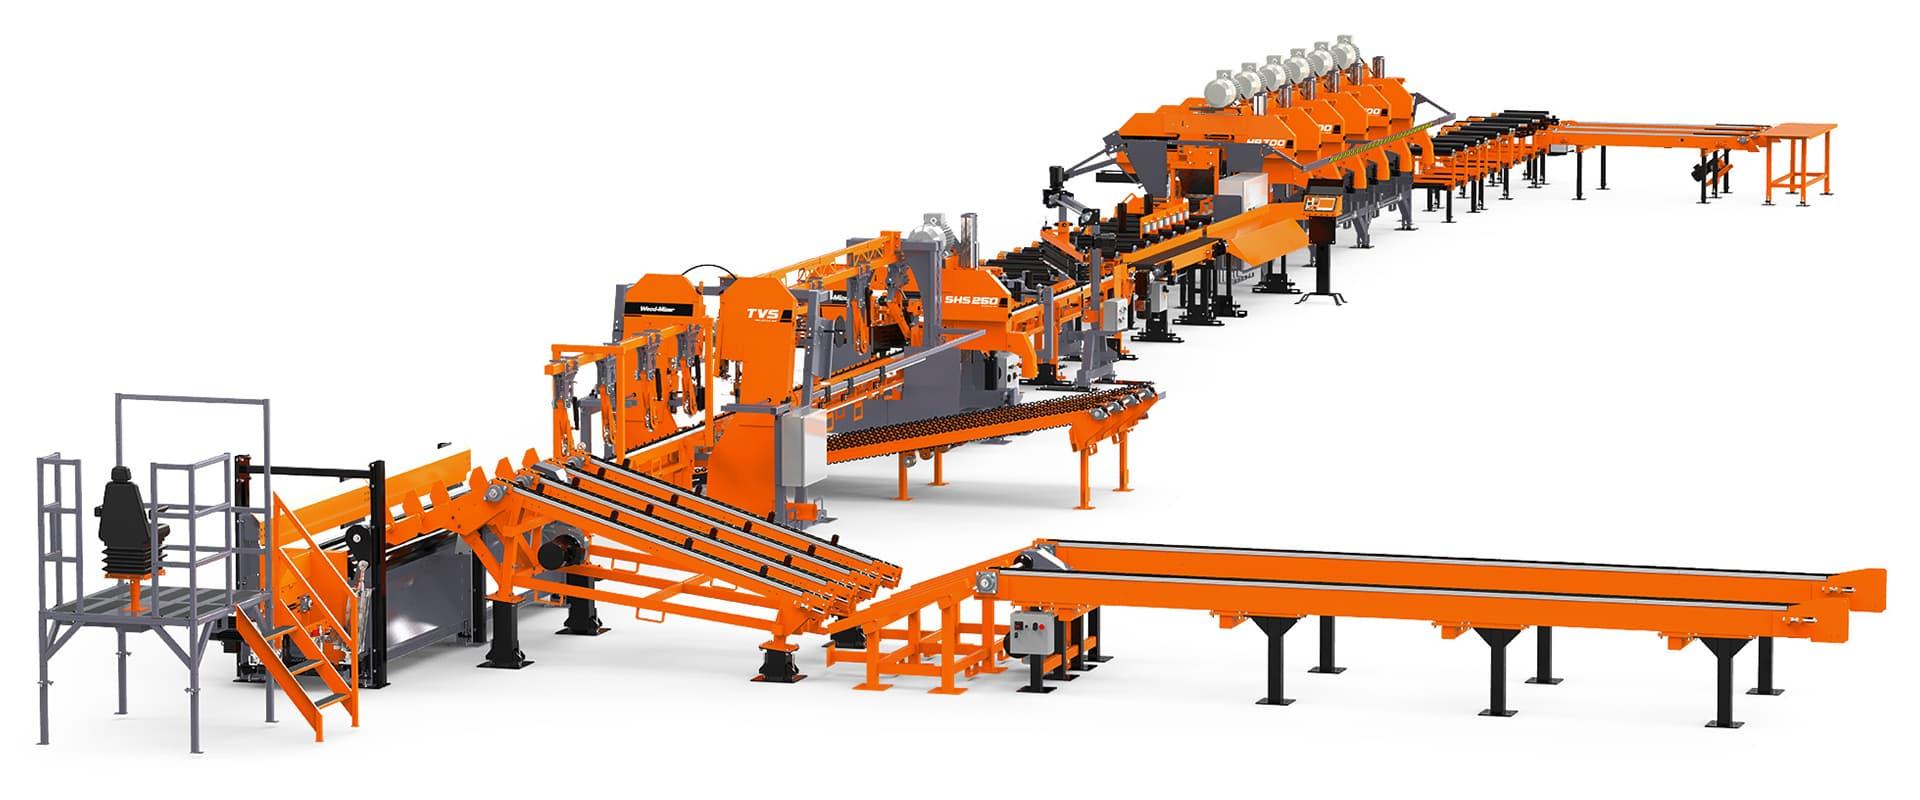 SLP2 Small Log Processing Line